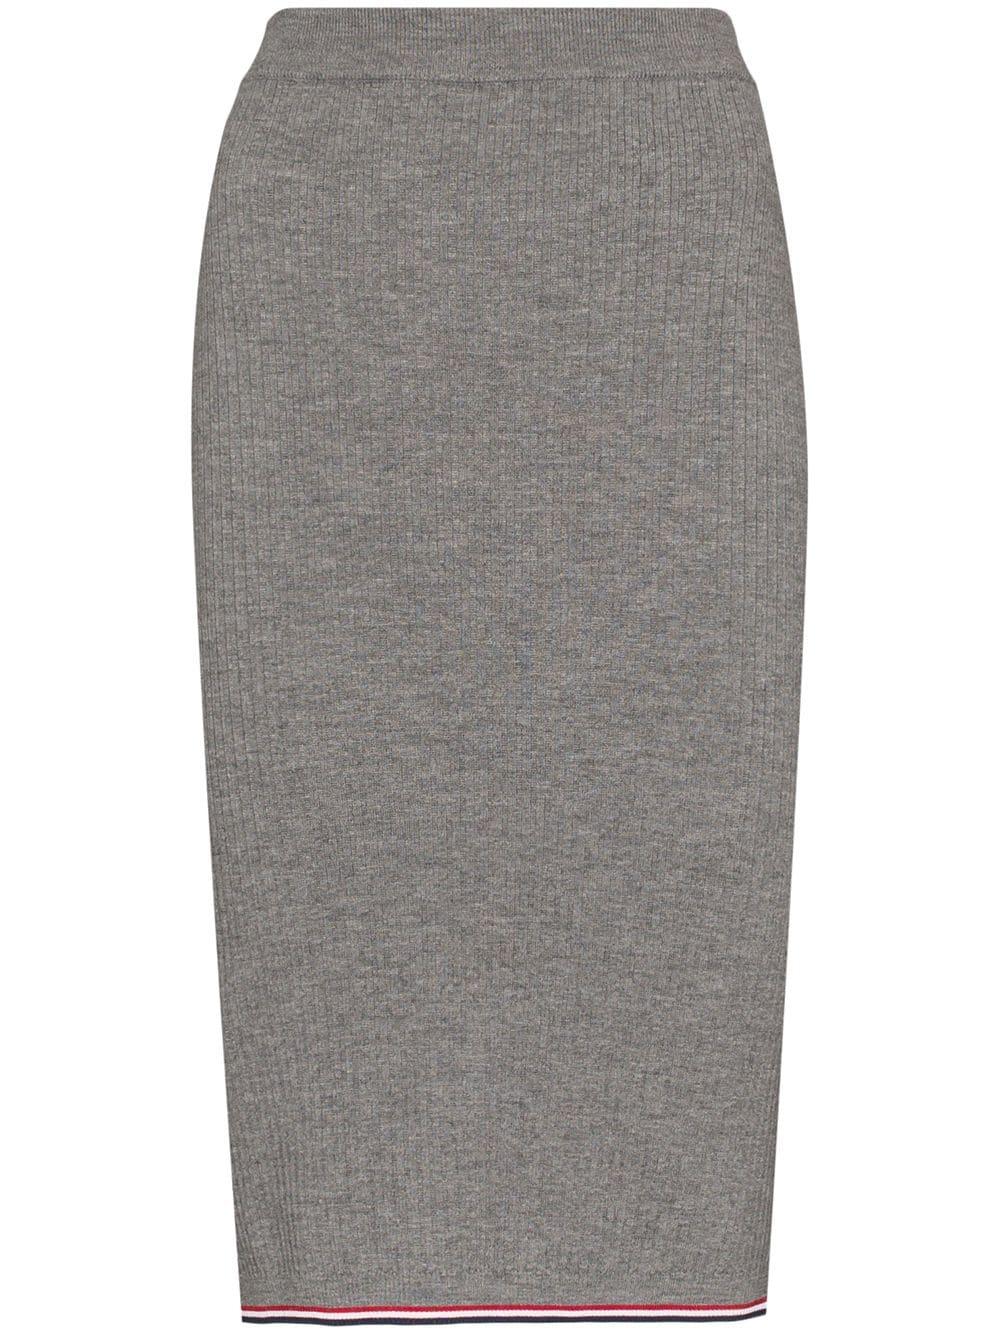 Thom Browne tri-stripe detail ribbed pencil skirt